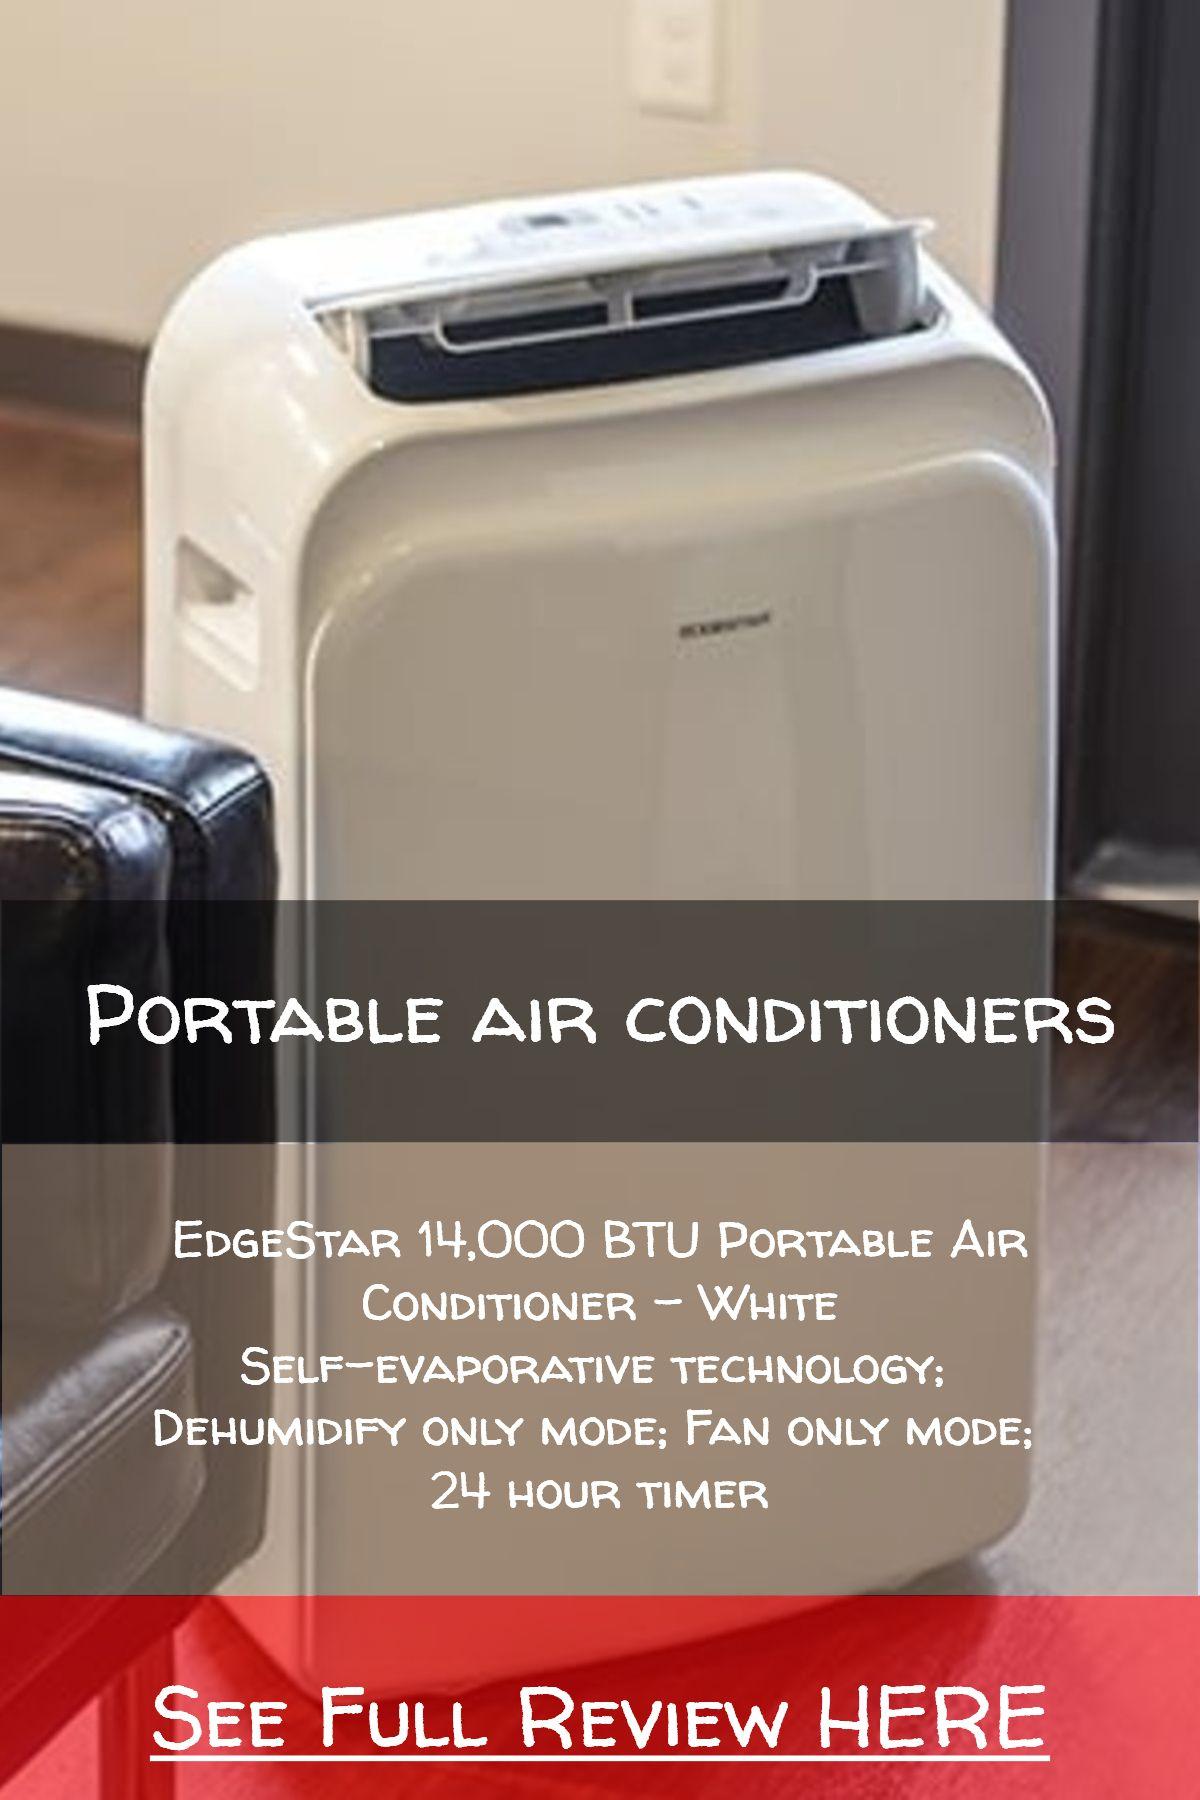 Portable air conditioners / EdgeStar 14,000 BTU Portable